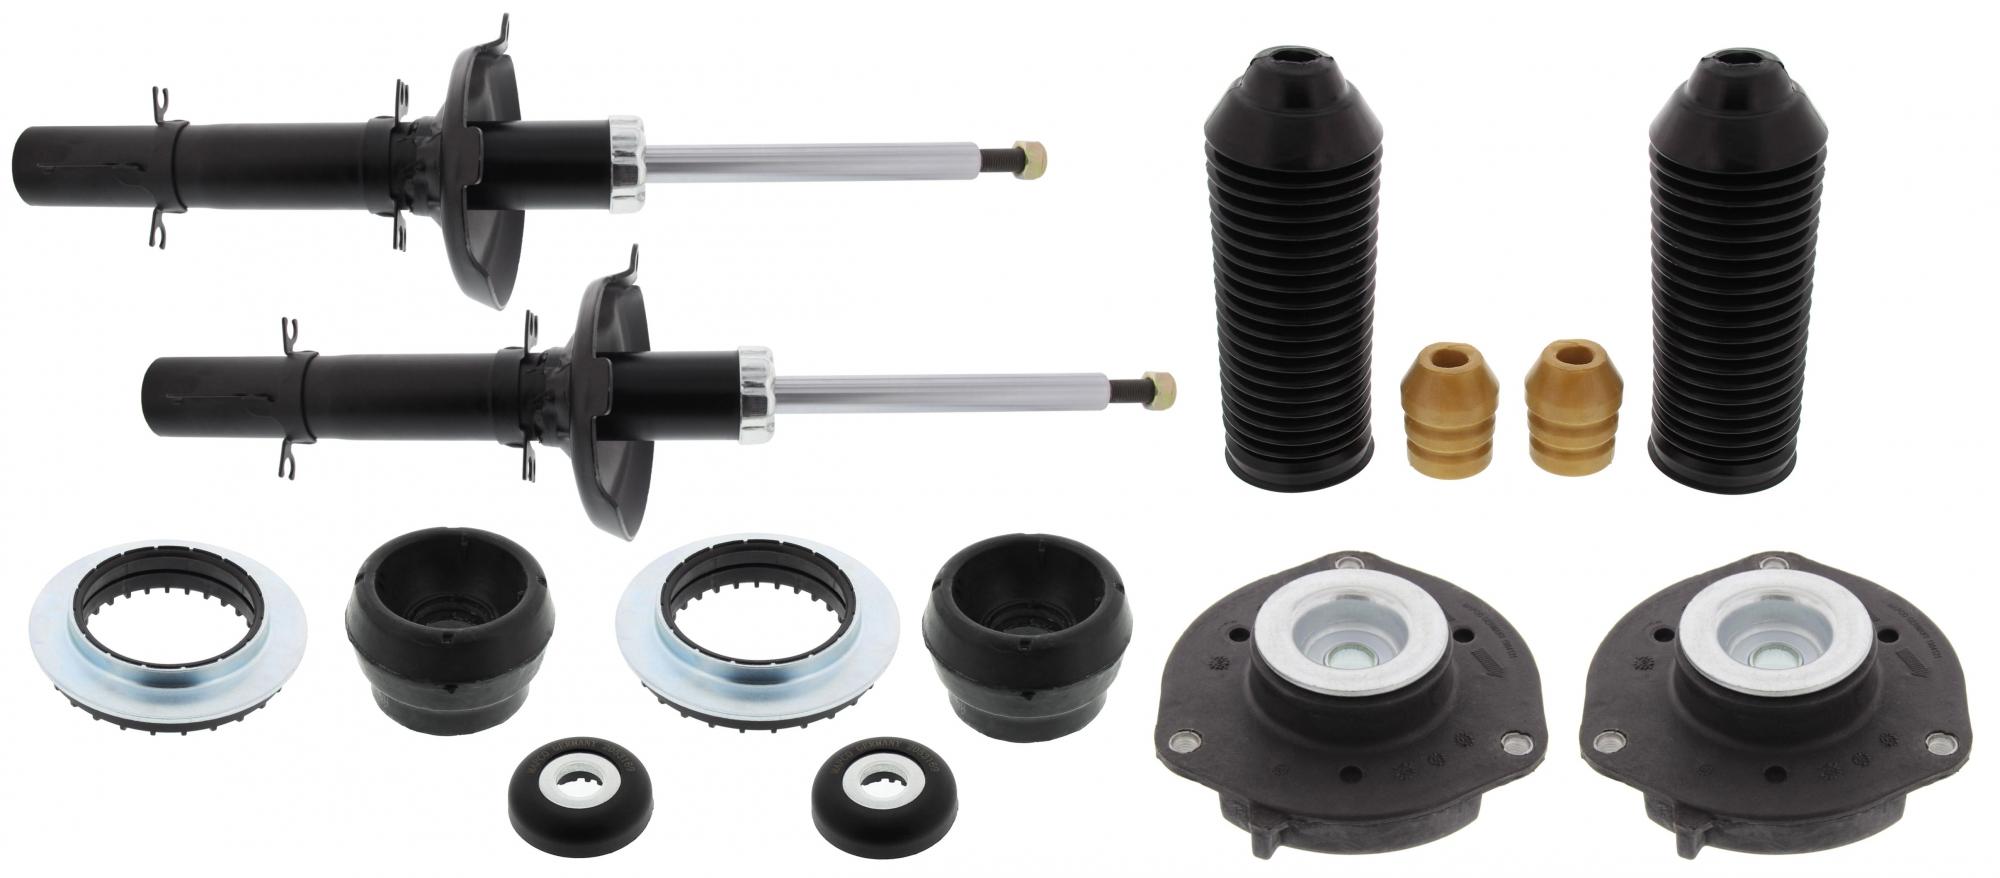 MAPCO 40973 Mounting Kit, shock absorber